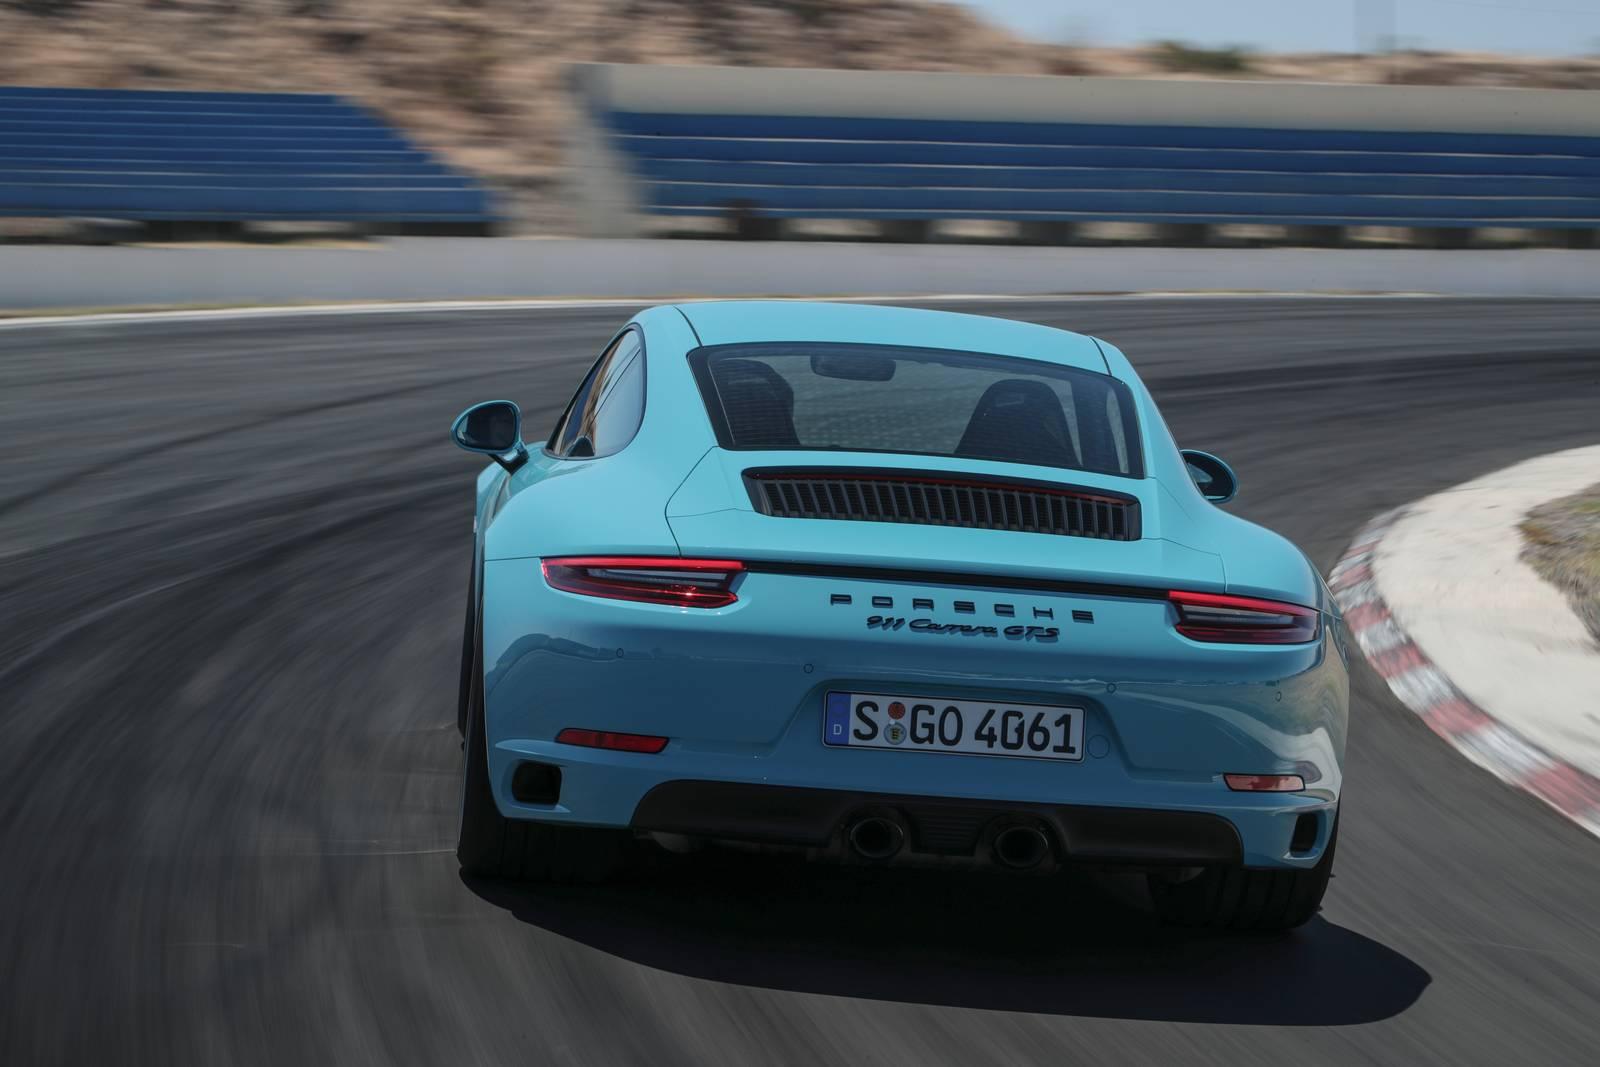 2017 Porsche 911 Gts Faster Than 991 1 Gt3 At Nurburgring